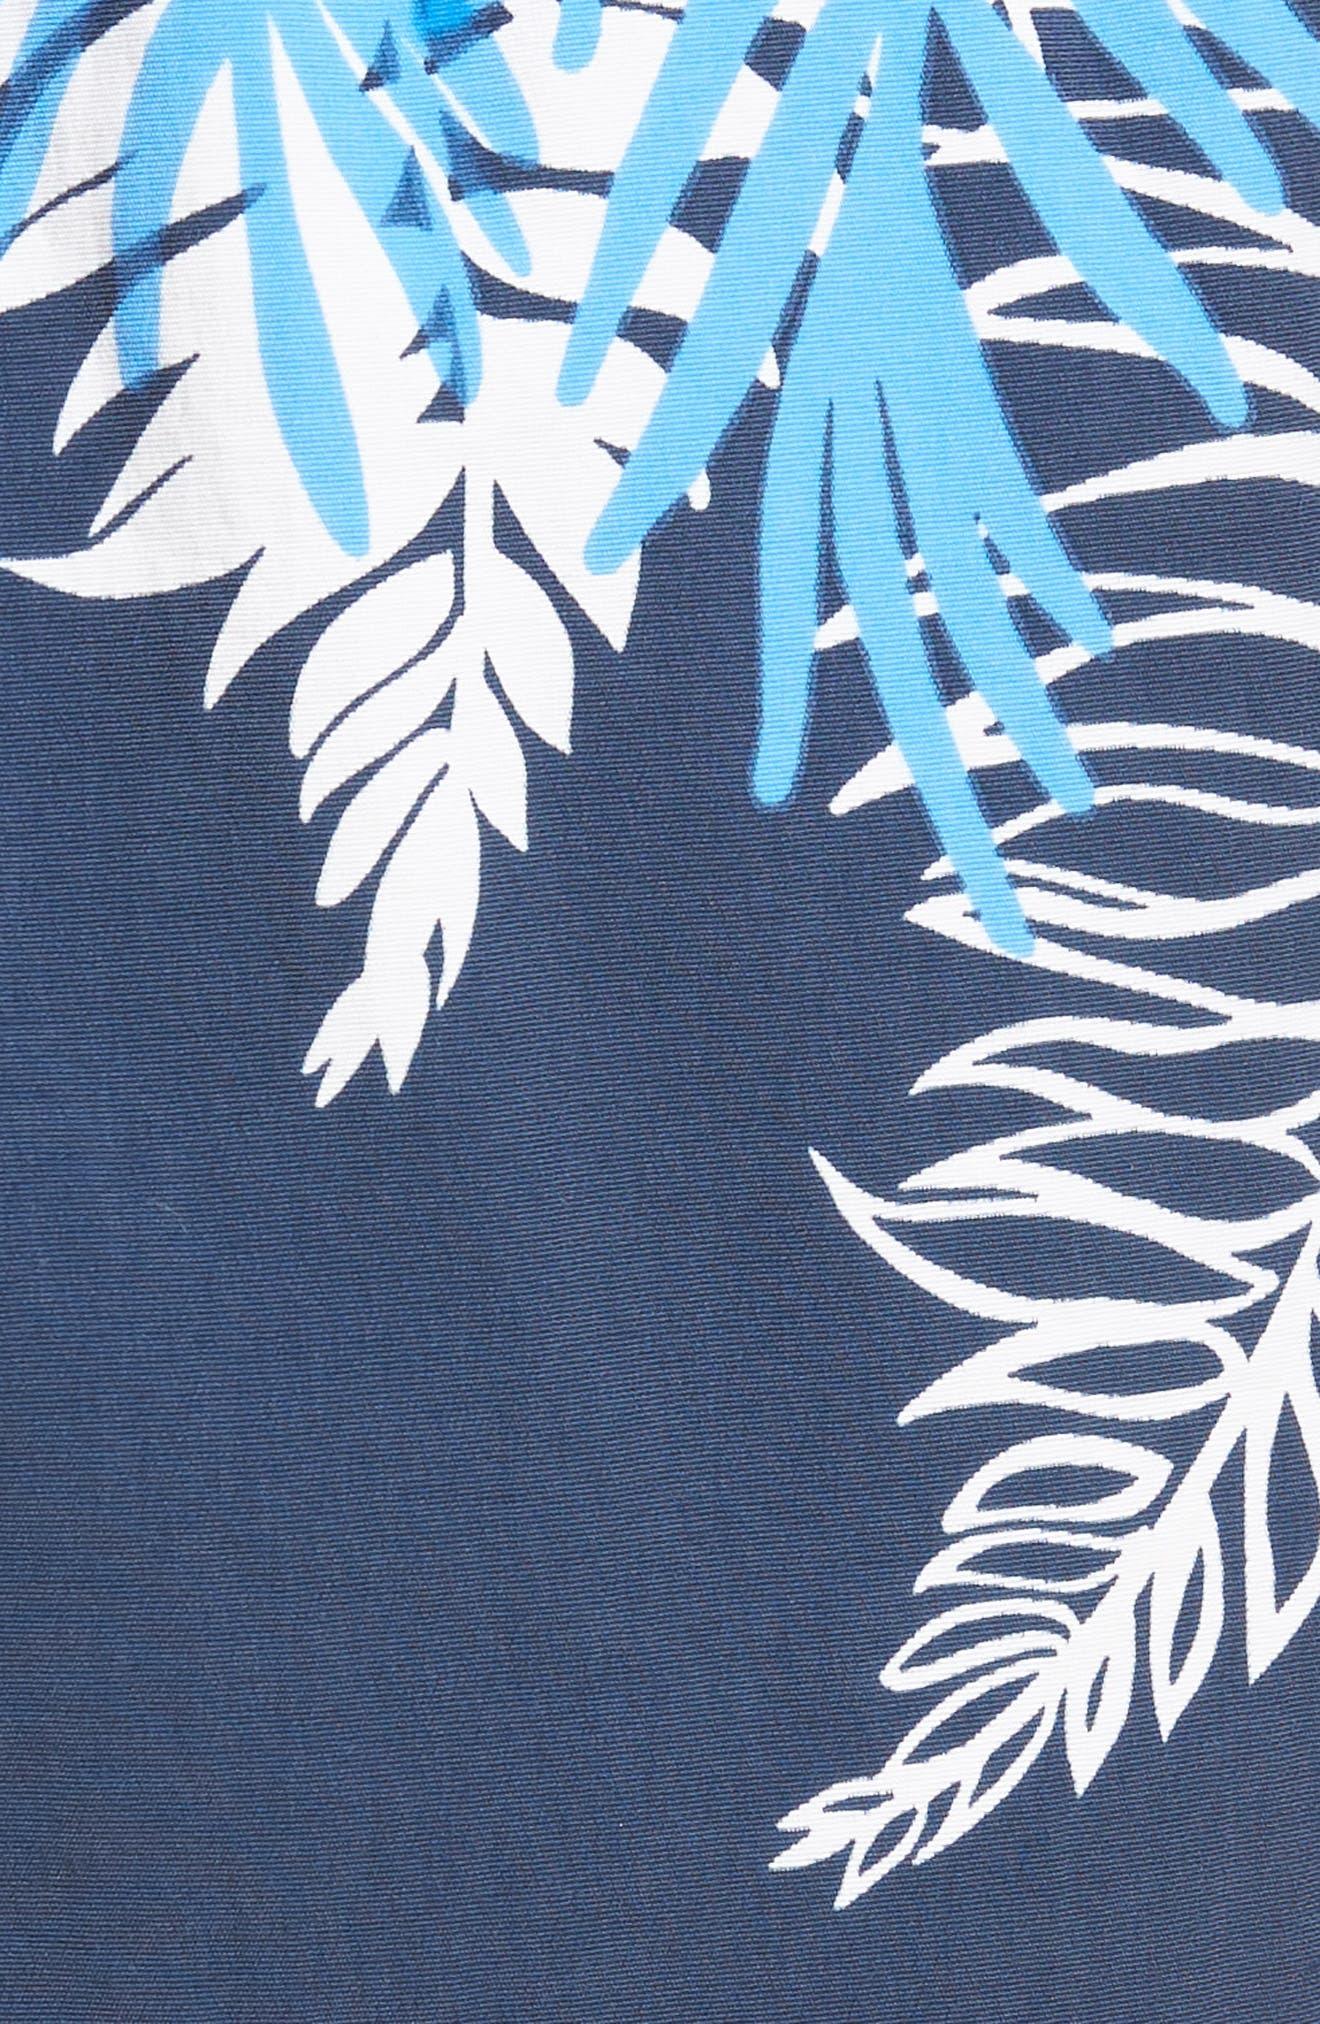 Naples Hacienda Board Shorts,                             Alternate thumbnail 5, color,                             OCEAN DEEP